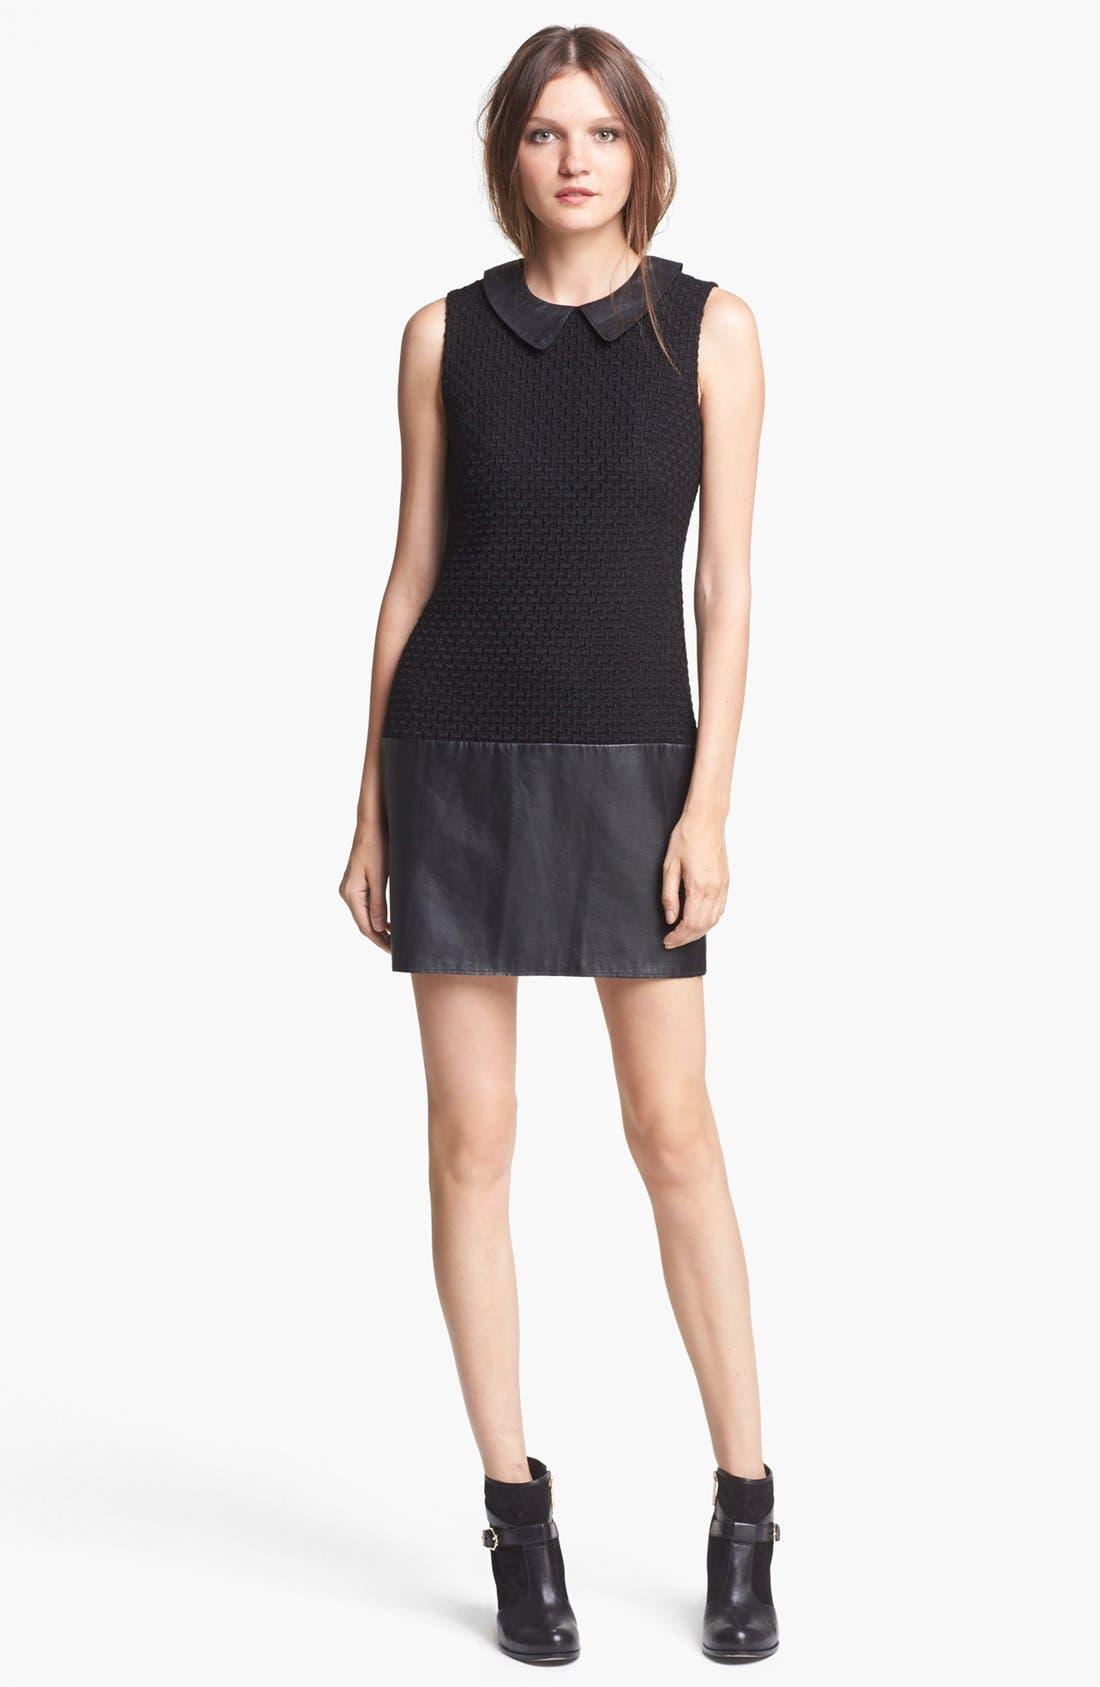 Alternate Image 1 Selected - Rachel Zoe 'Dallas' Leather & Wool Blend Dress